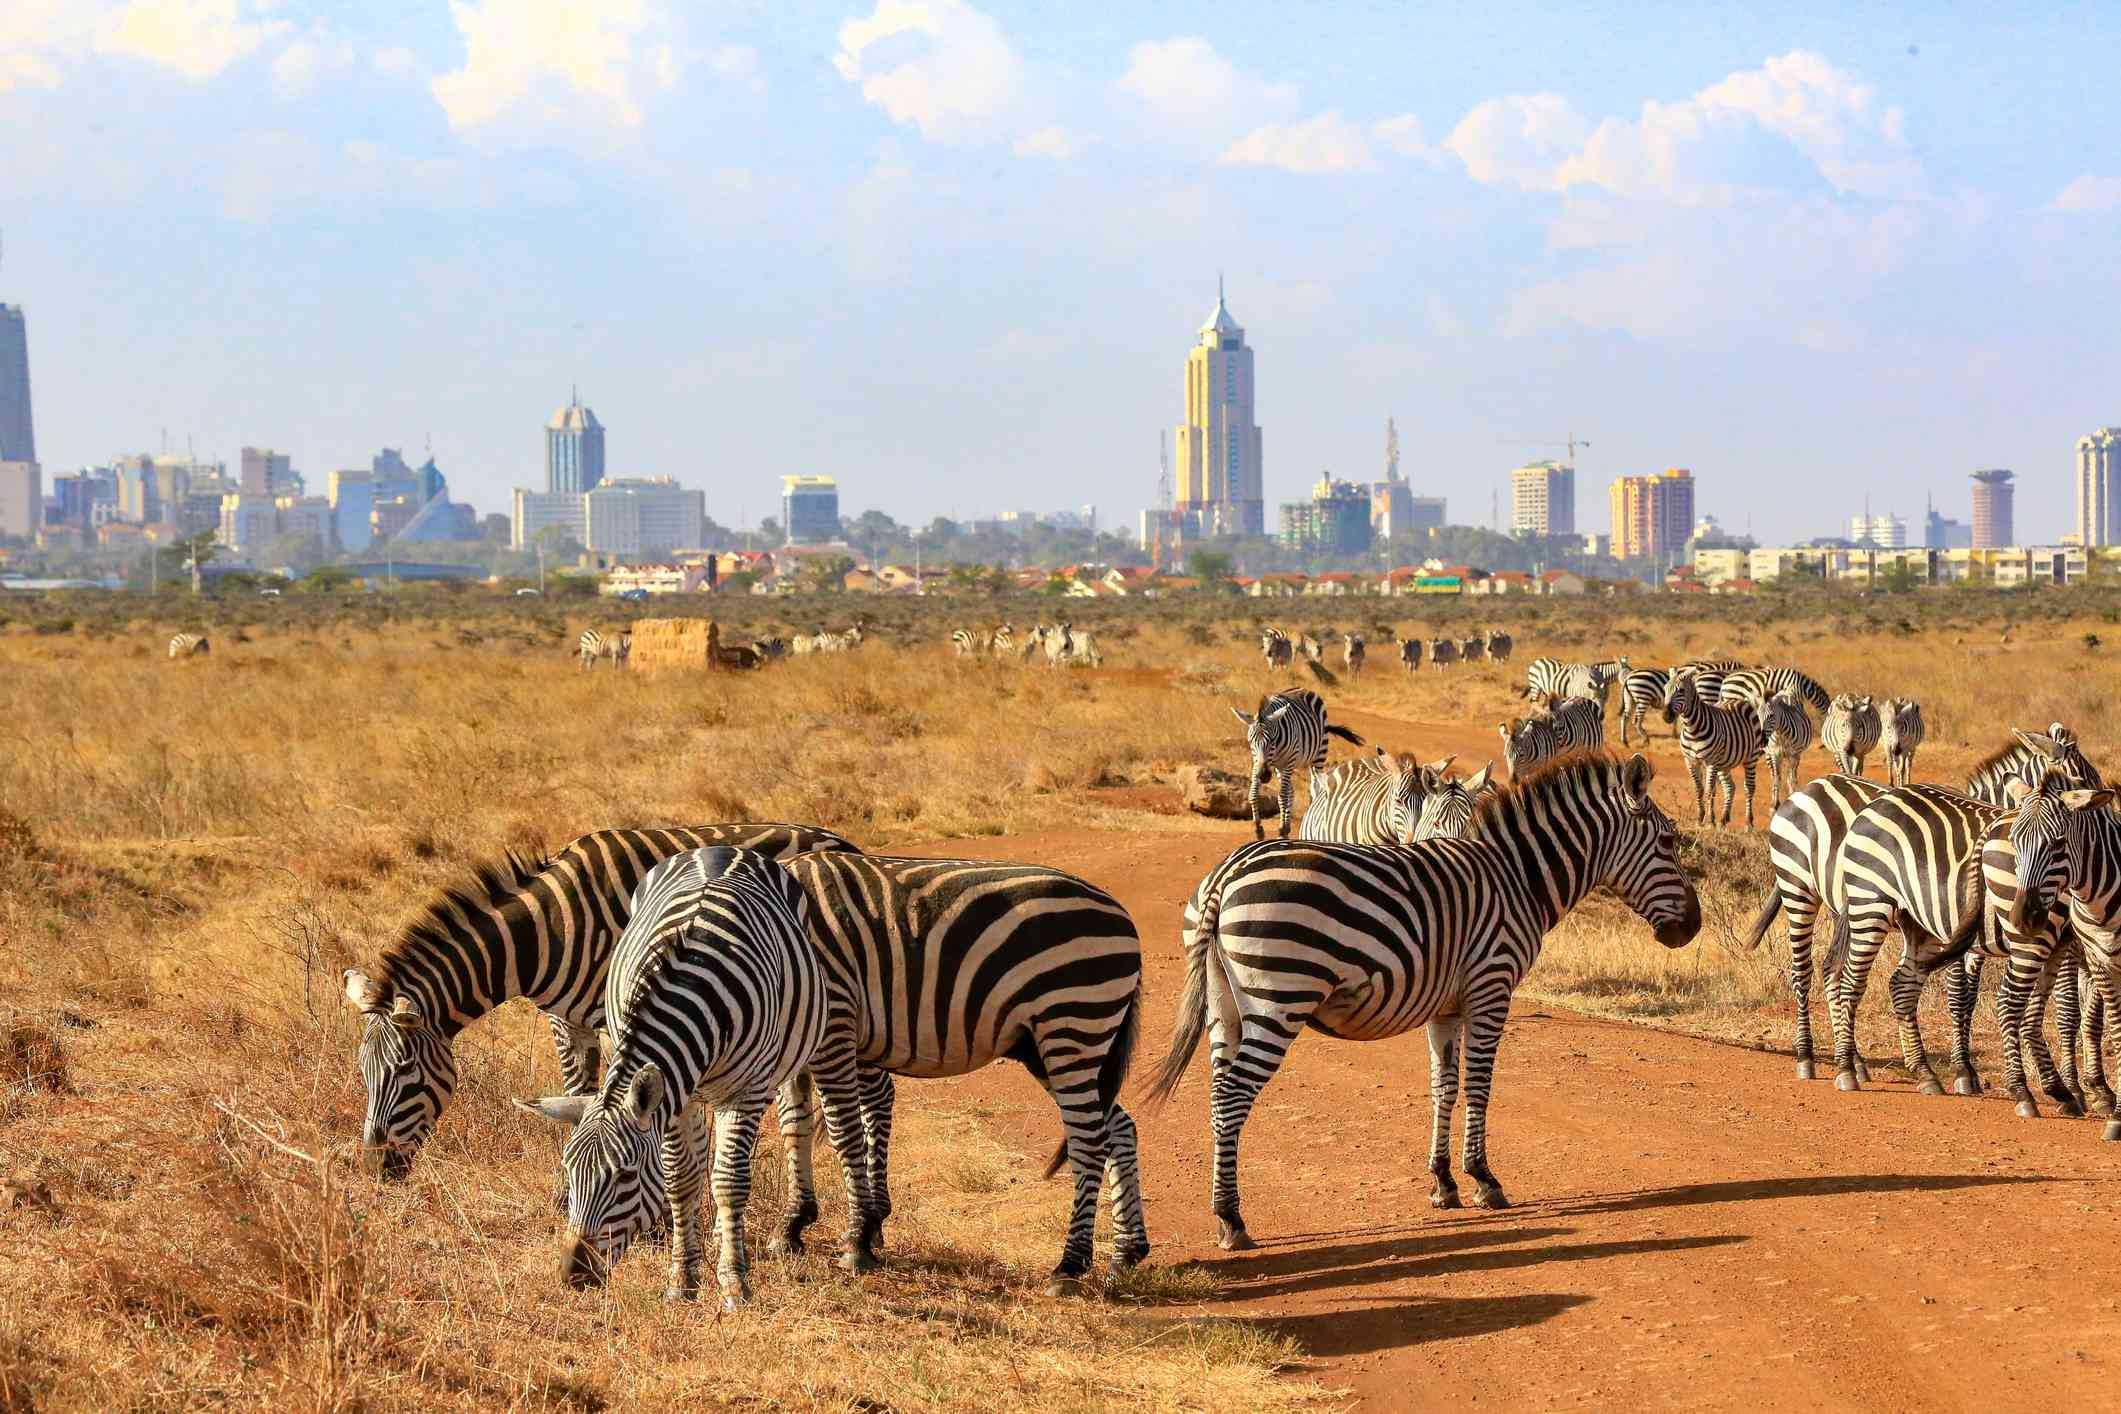 A herd of zebras in Nairobi National Park, Kenya